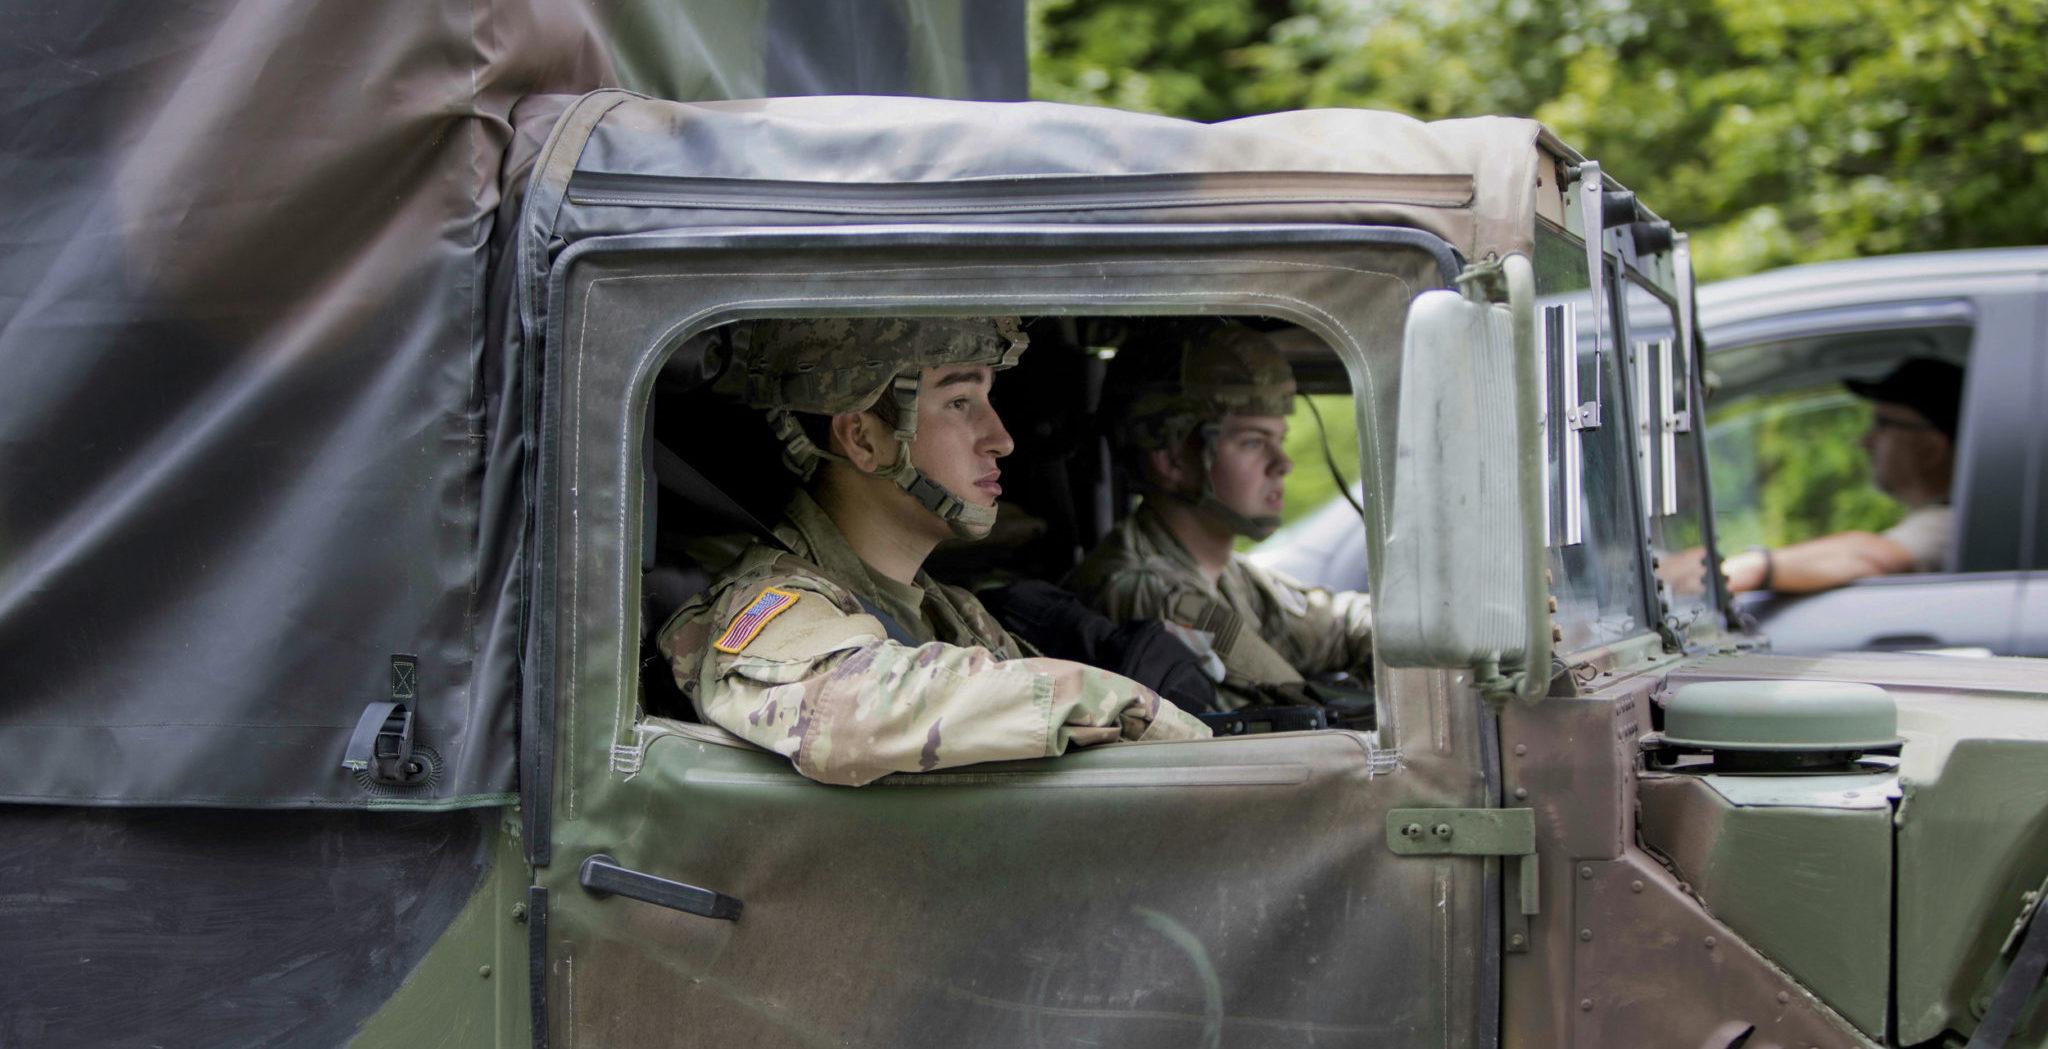 Training rollover kills West Point cadet, injures many